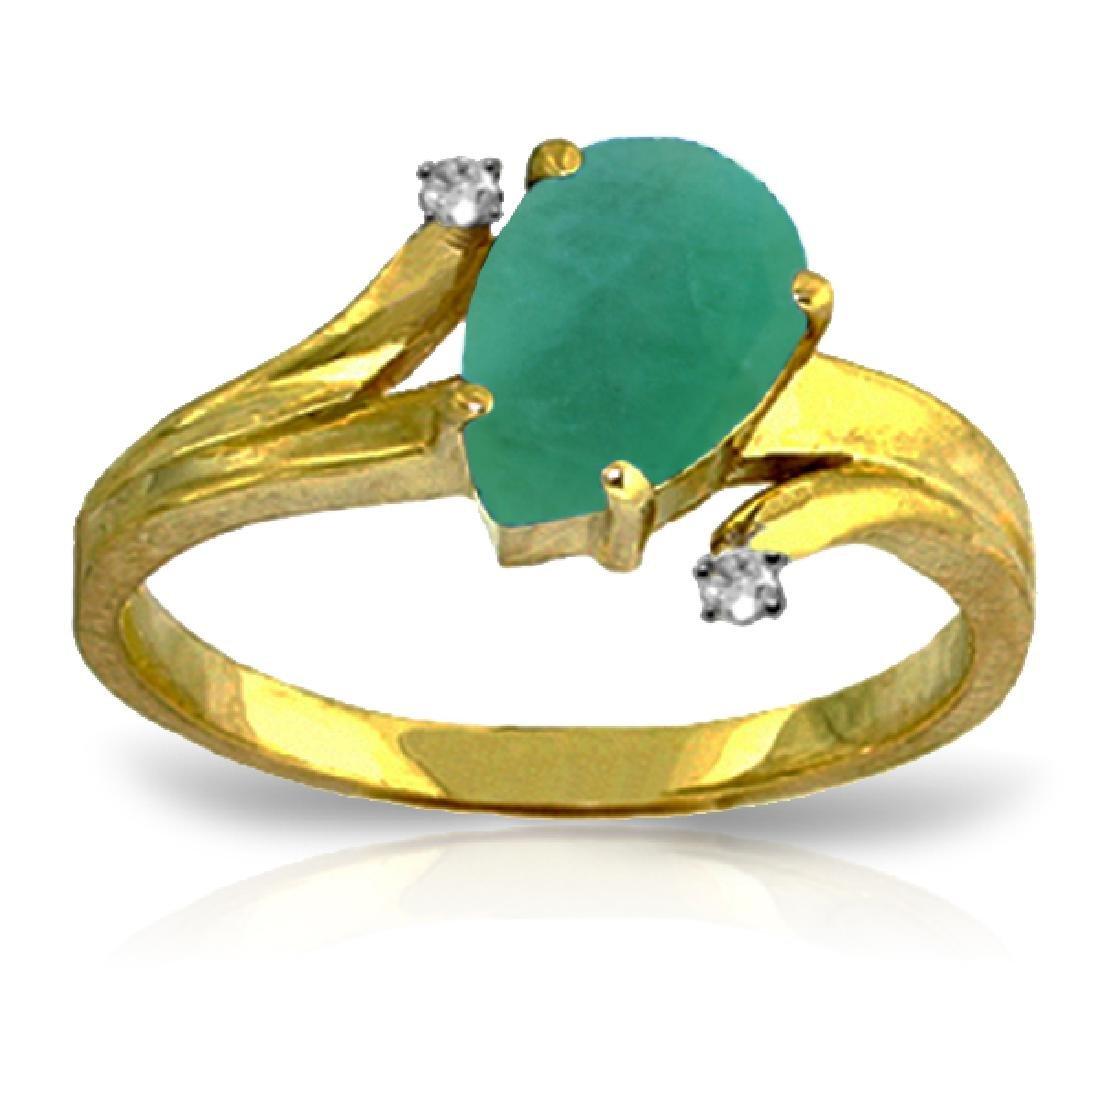 Genuine 1.01 ctw Emerald & Diamond Ring Jewelry 14KT